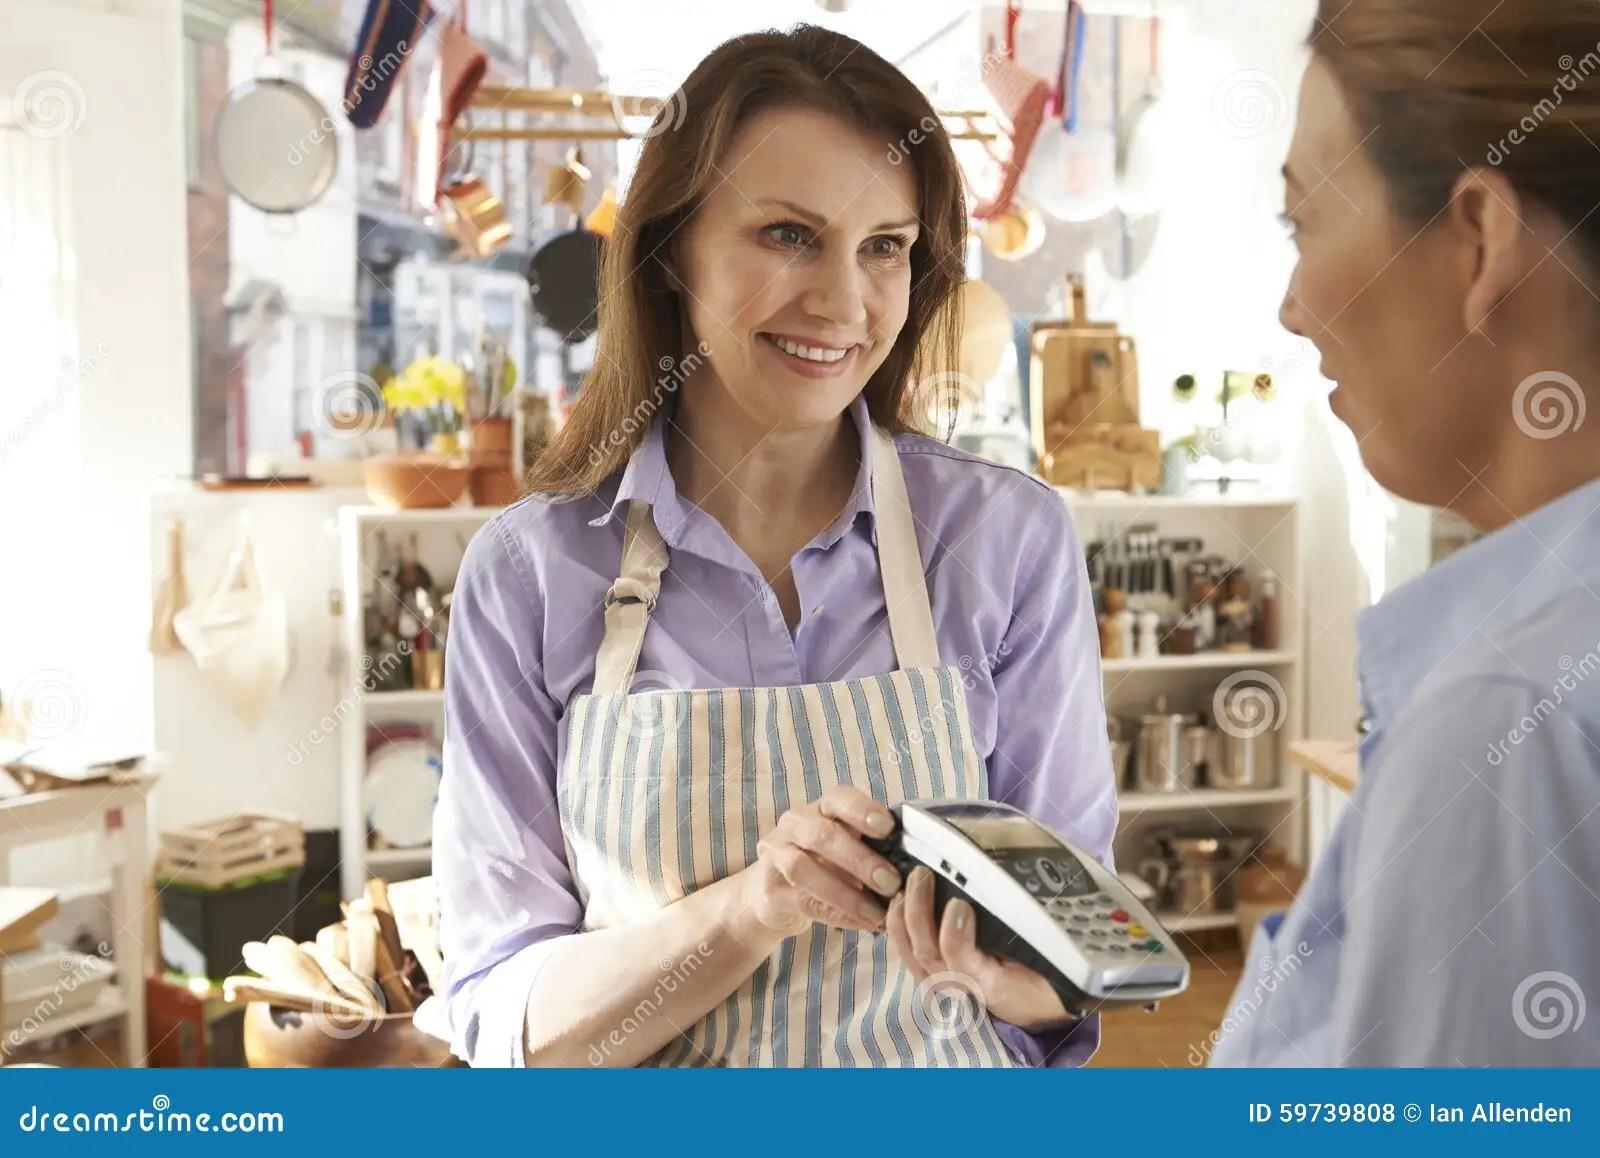 kitchens store restaurant kitchen equipment 支付在厨房商店的顾客使用信用卡终端库存照片 图片包括有设备 户内 支付在厨房商店的顾客使用信用卡终端